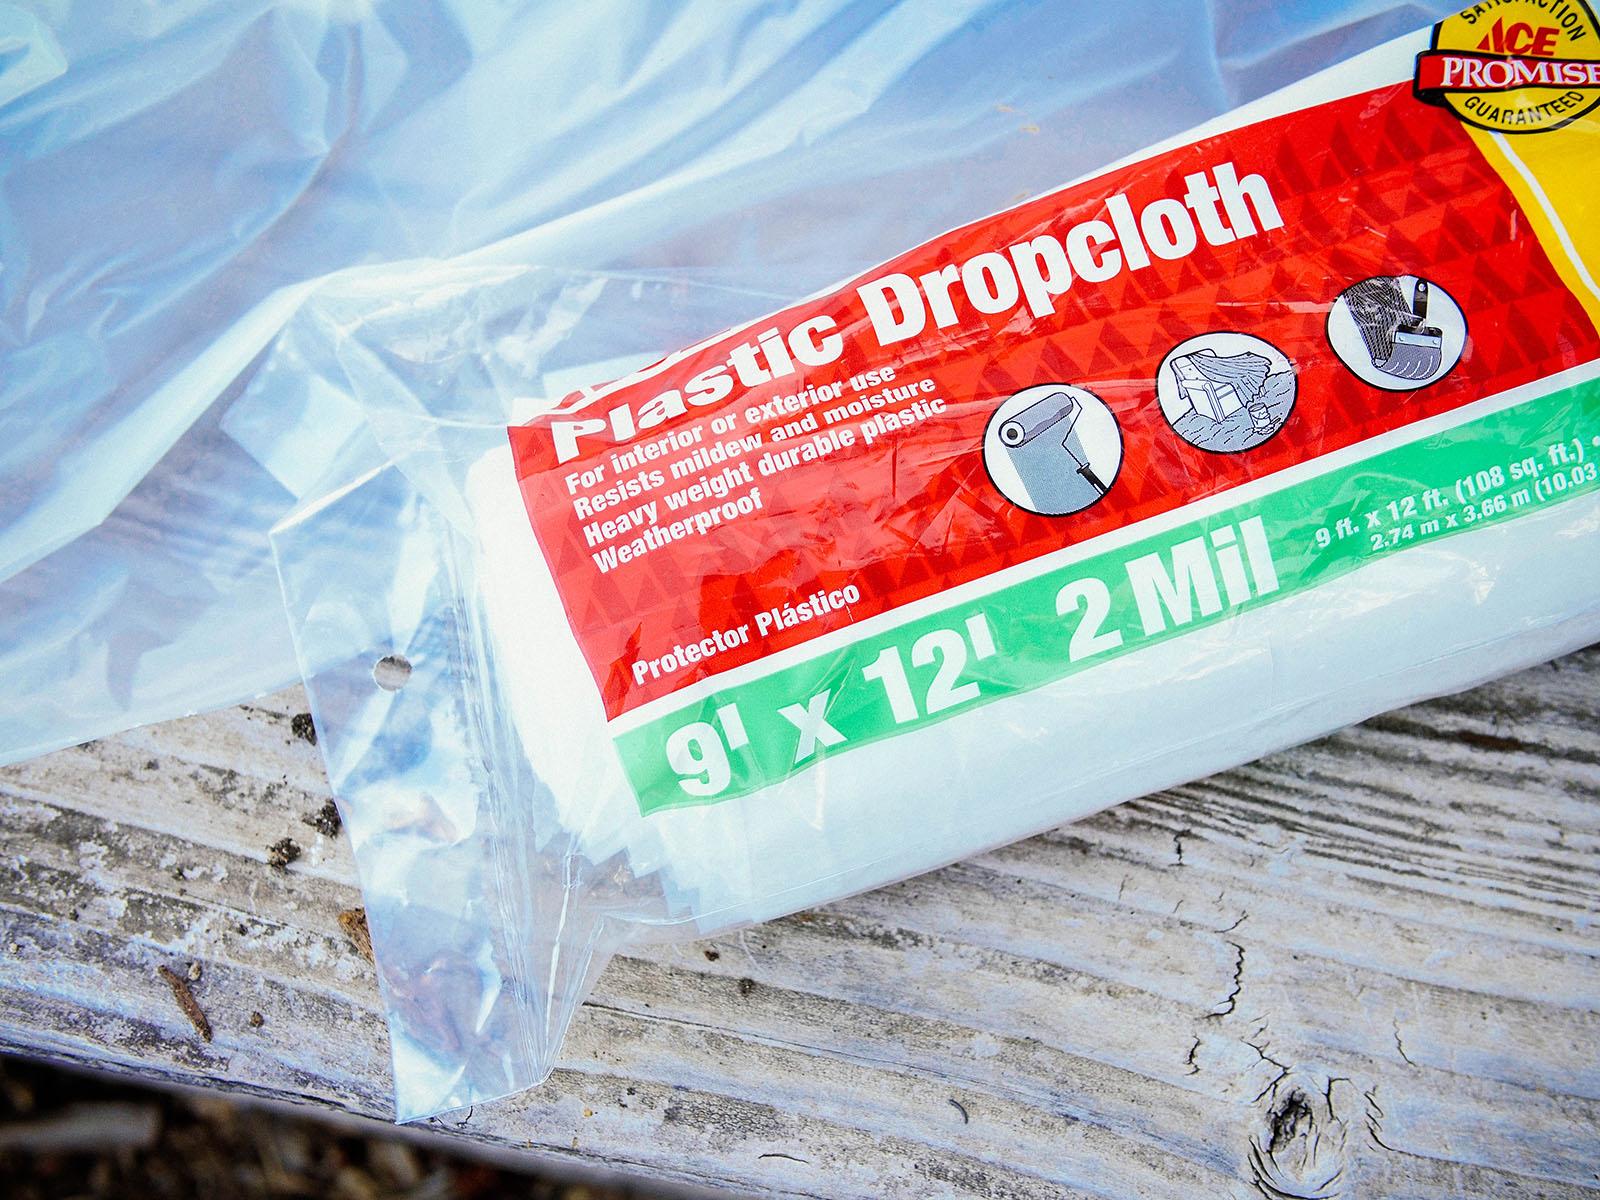 2 mm plastic dropcloth